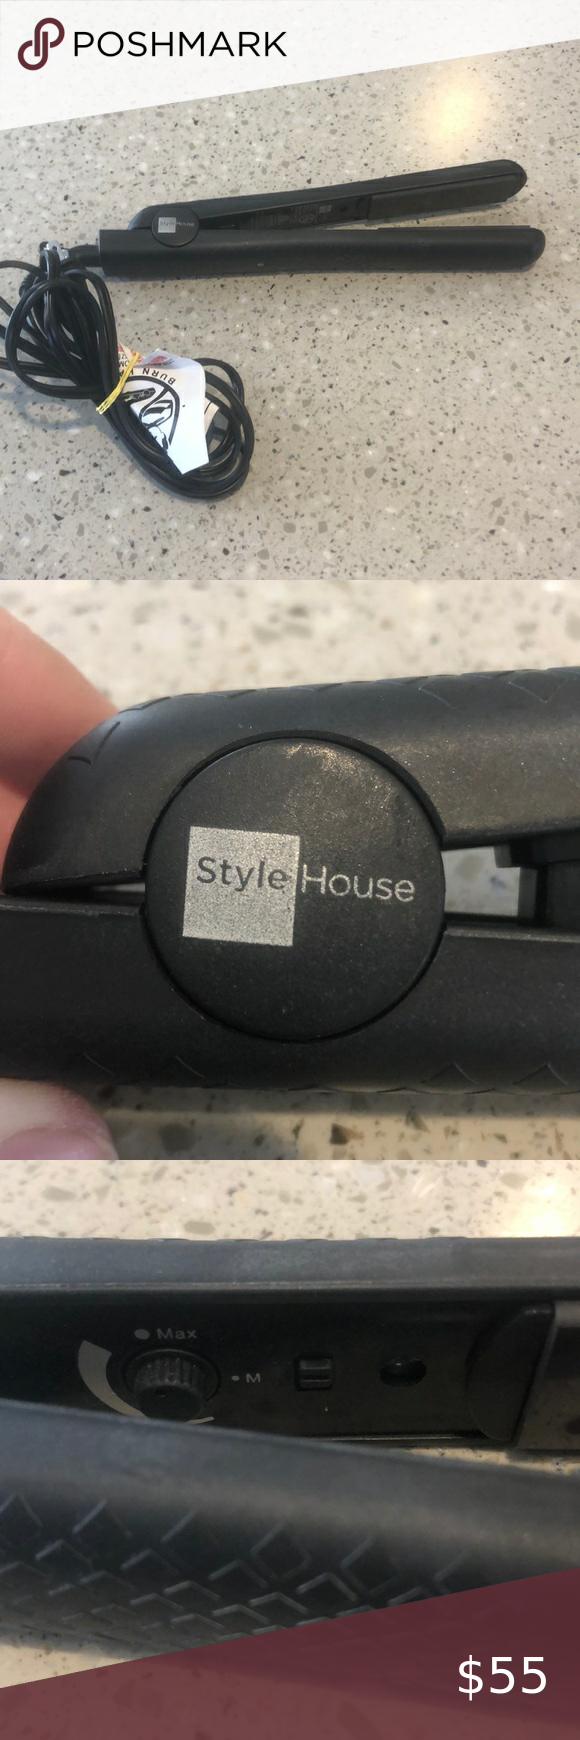 Style House Hair Straightener Style House Hair Straightener Accessories Hair Accessories In 2020 Style Hair Straightener Hair Accessories